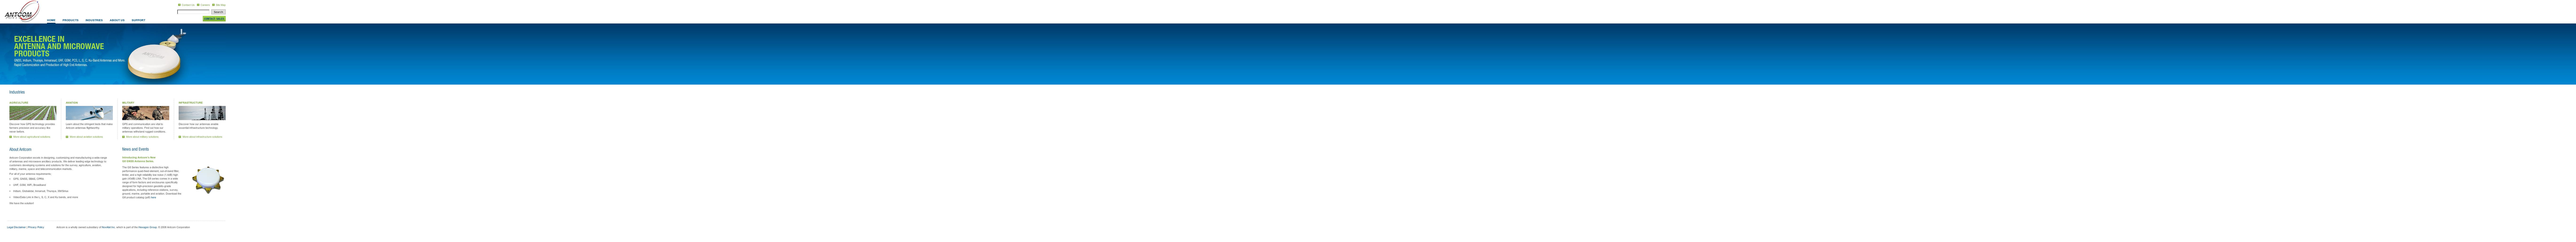 Antcom Competitors, Revenue and Employees - Owler Company